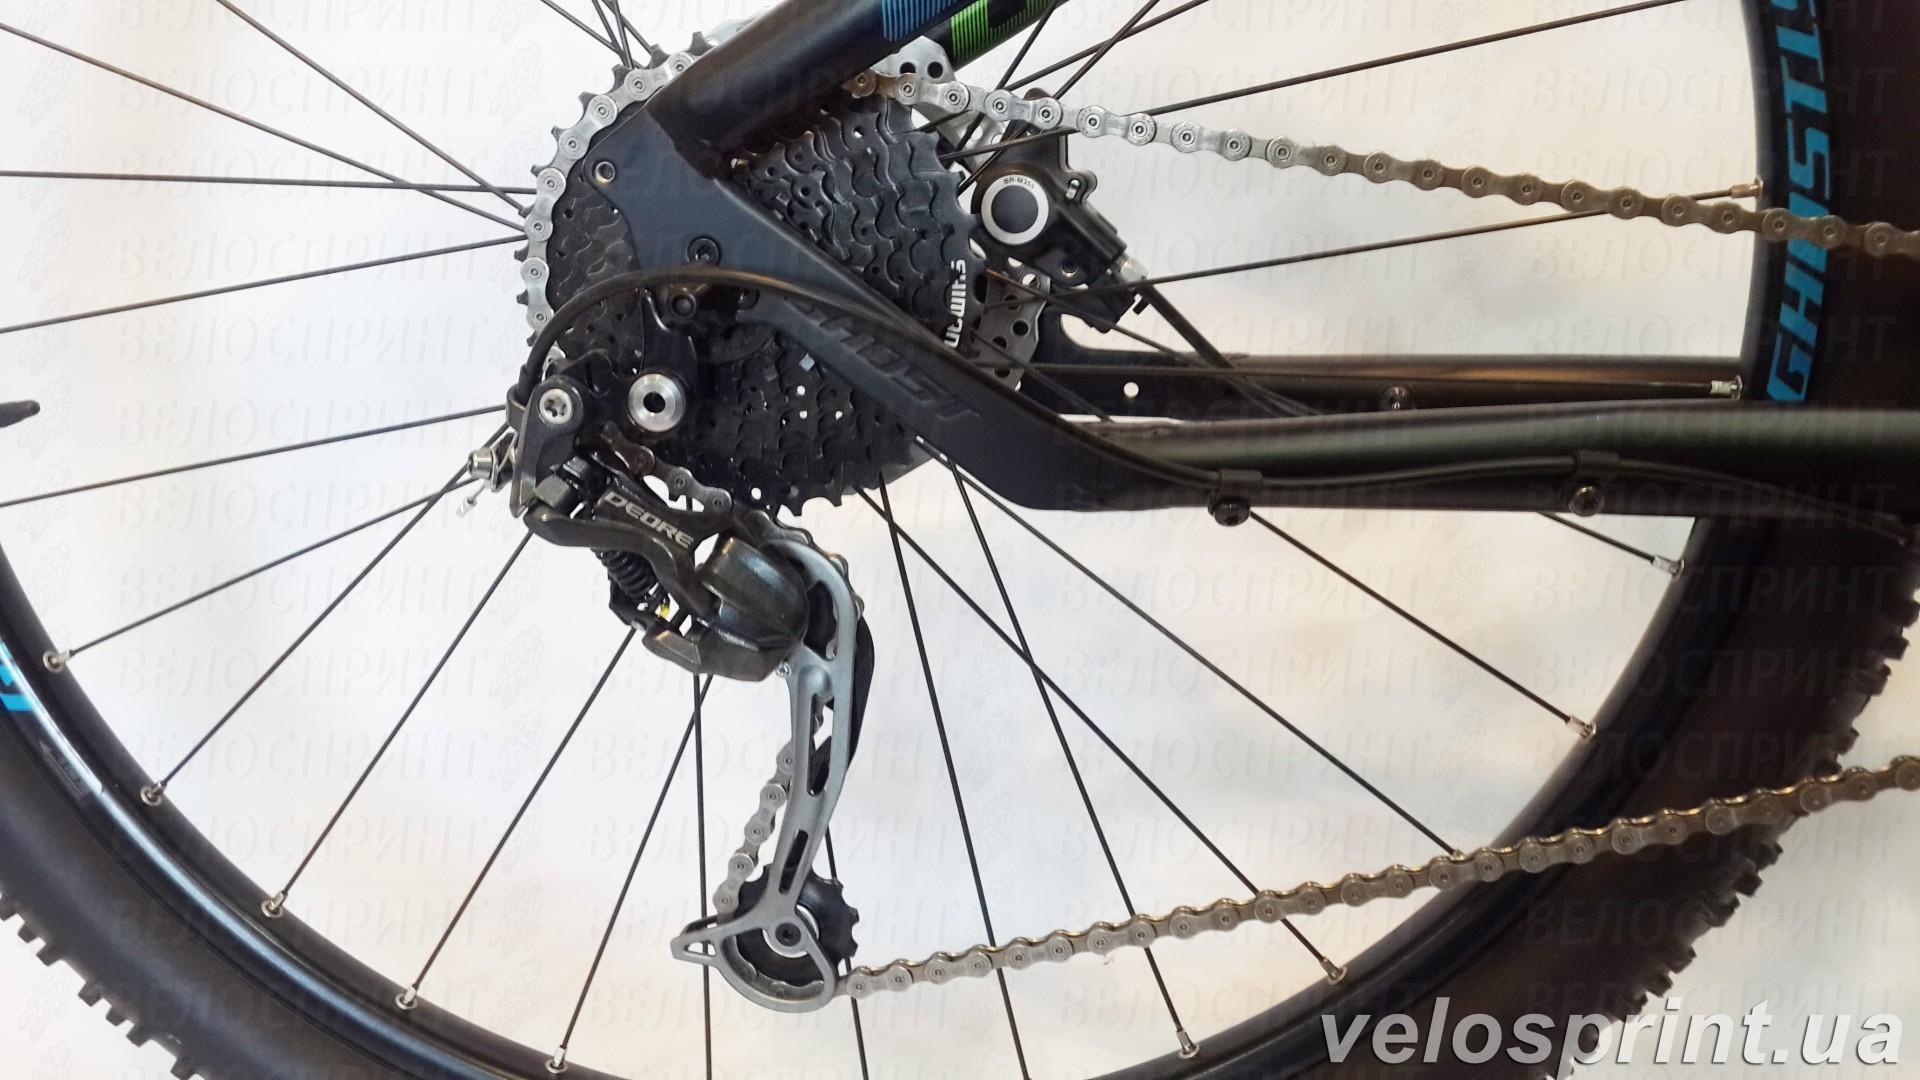 Велосипед GHOST Kato 4 black/green/blue задний переключатель год 2016